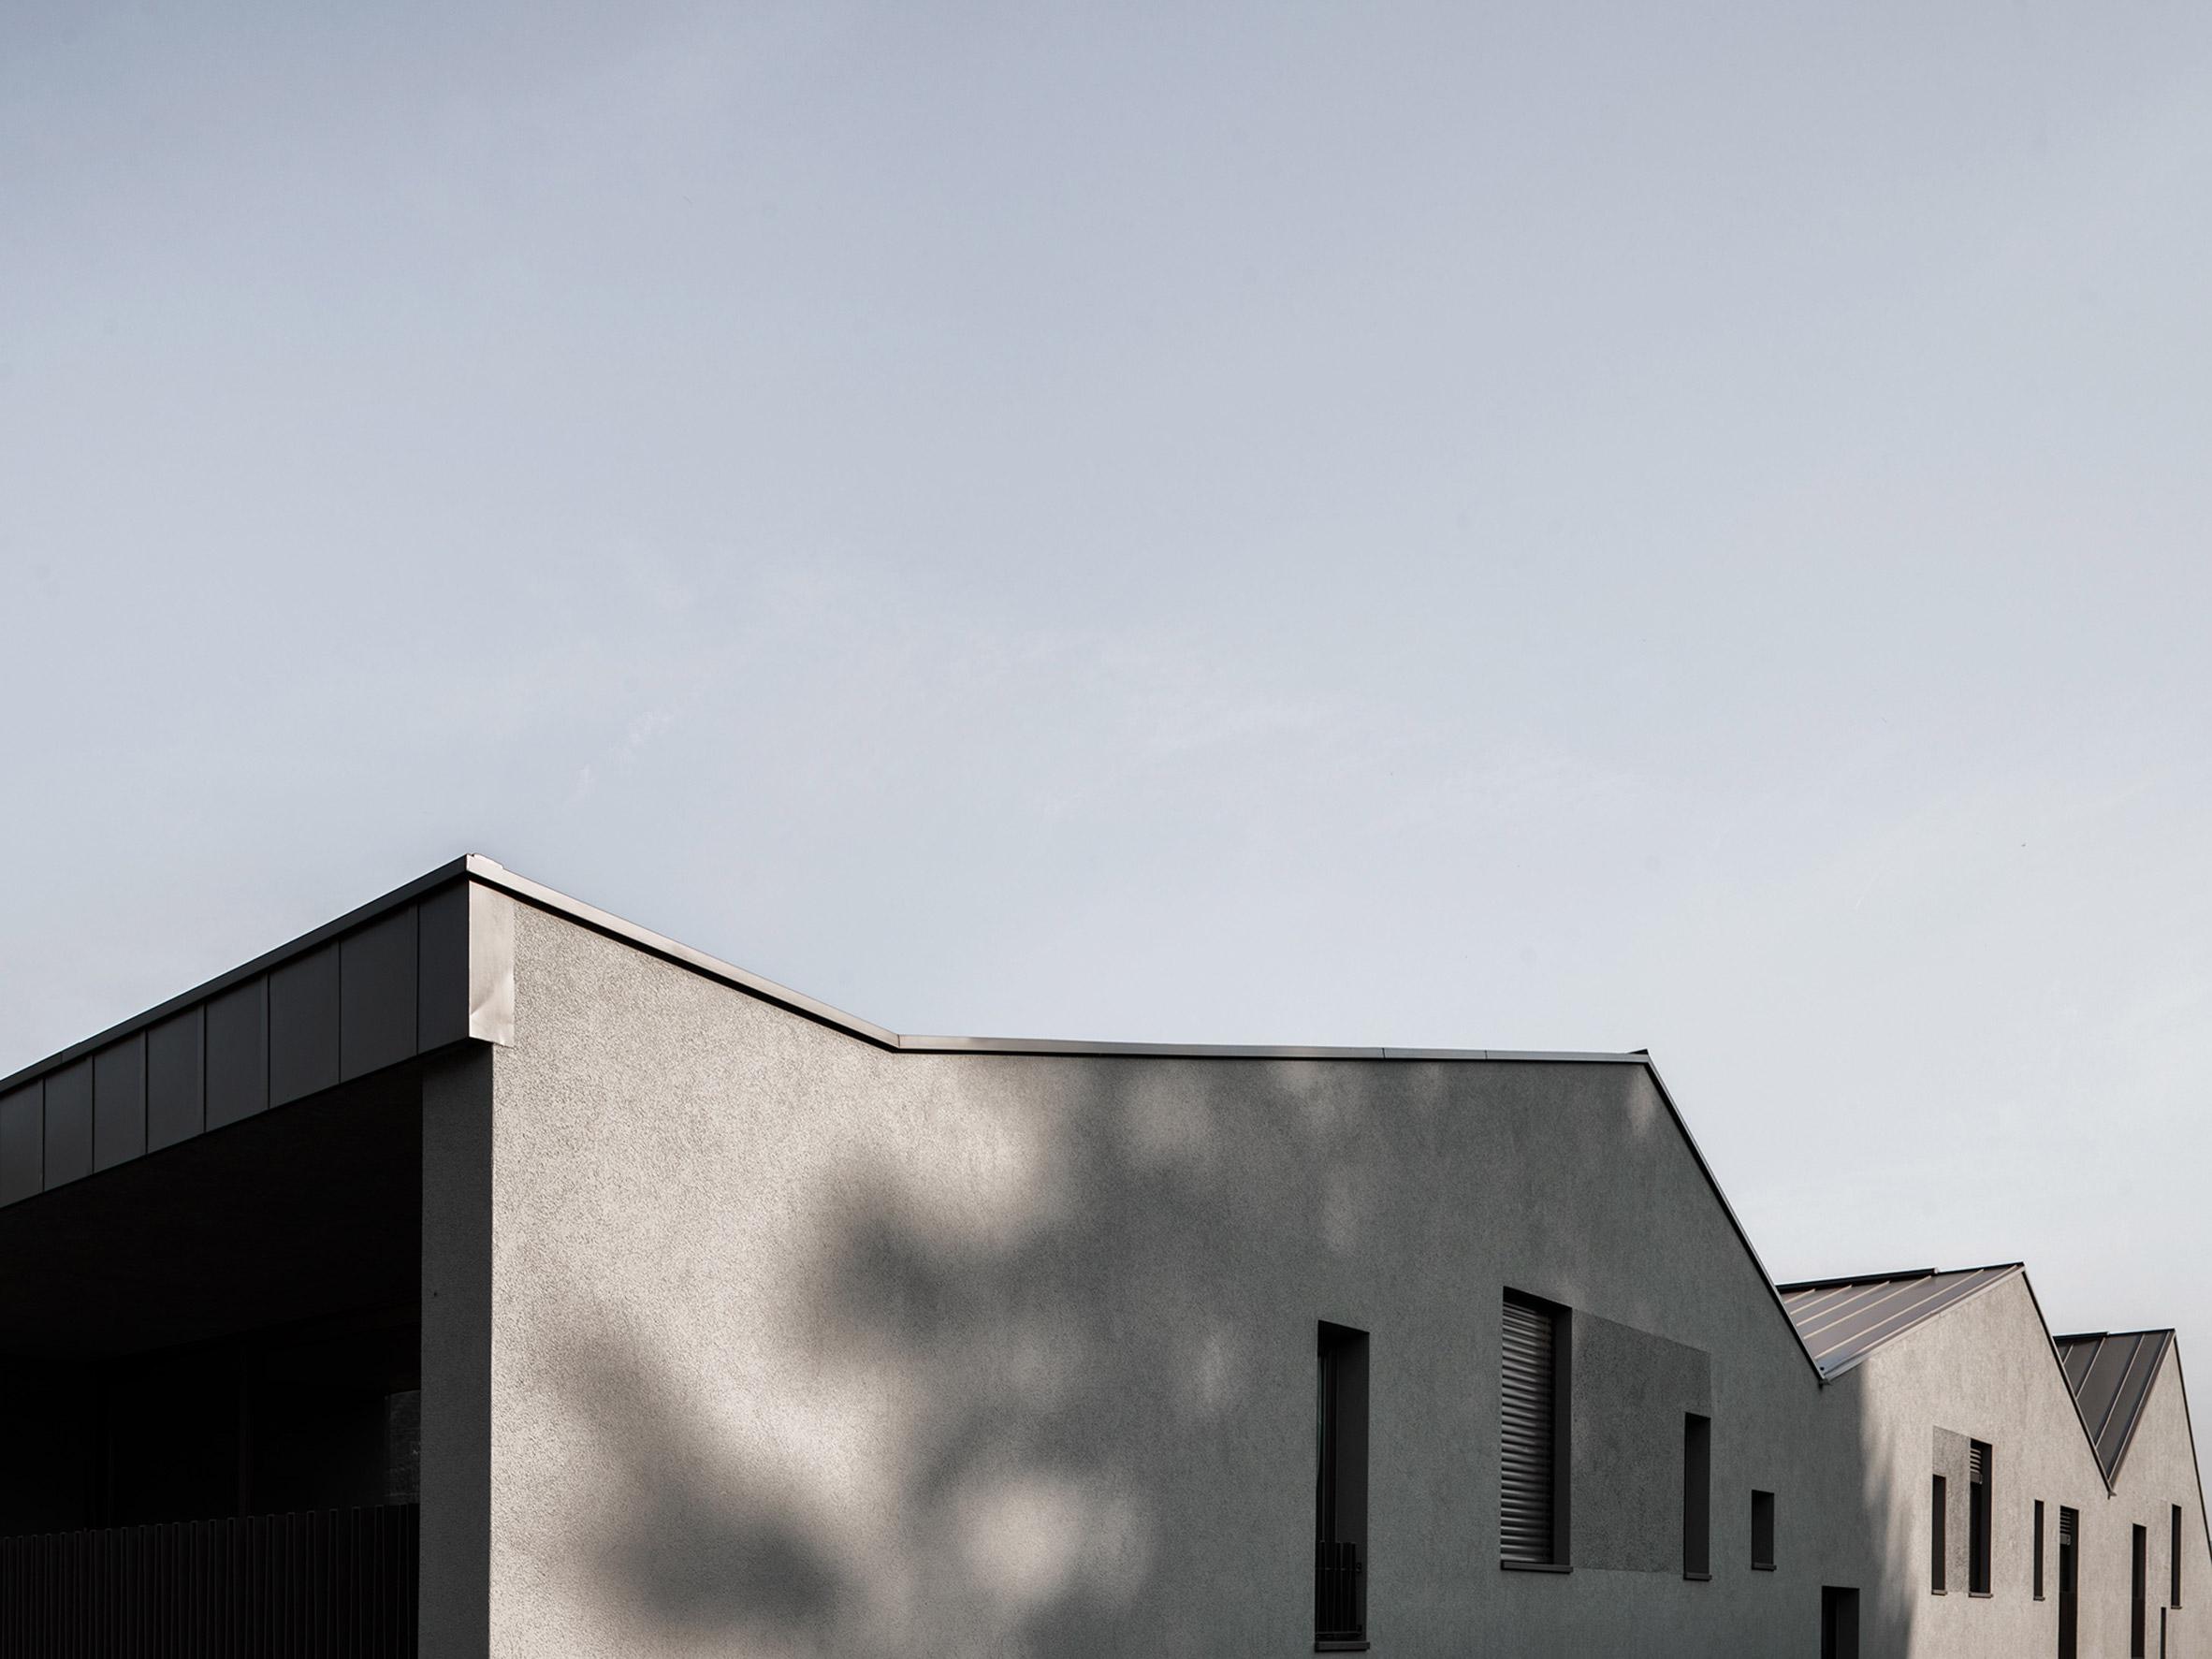 Eiger Mönch Junfrau House by Stocker Lee Architetti